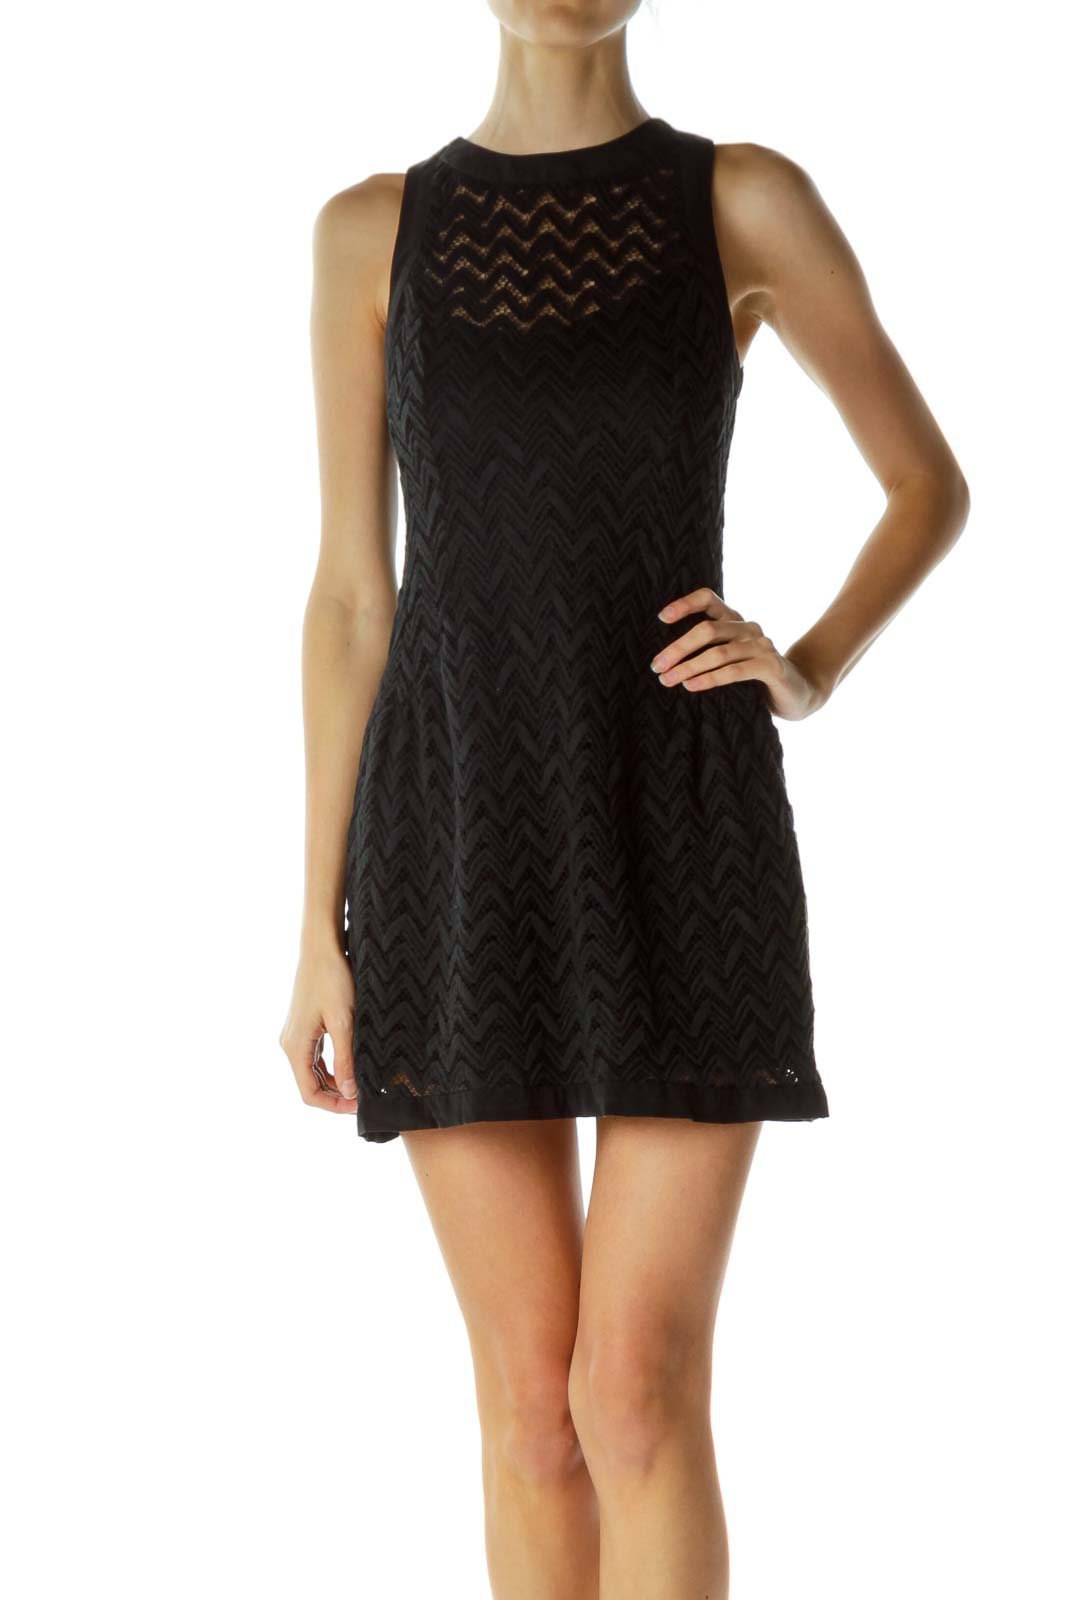 Black Sleeveless Knitted Dress with Slip